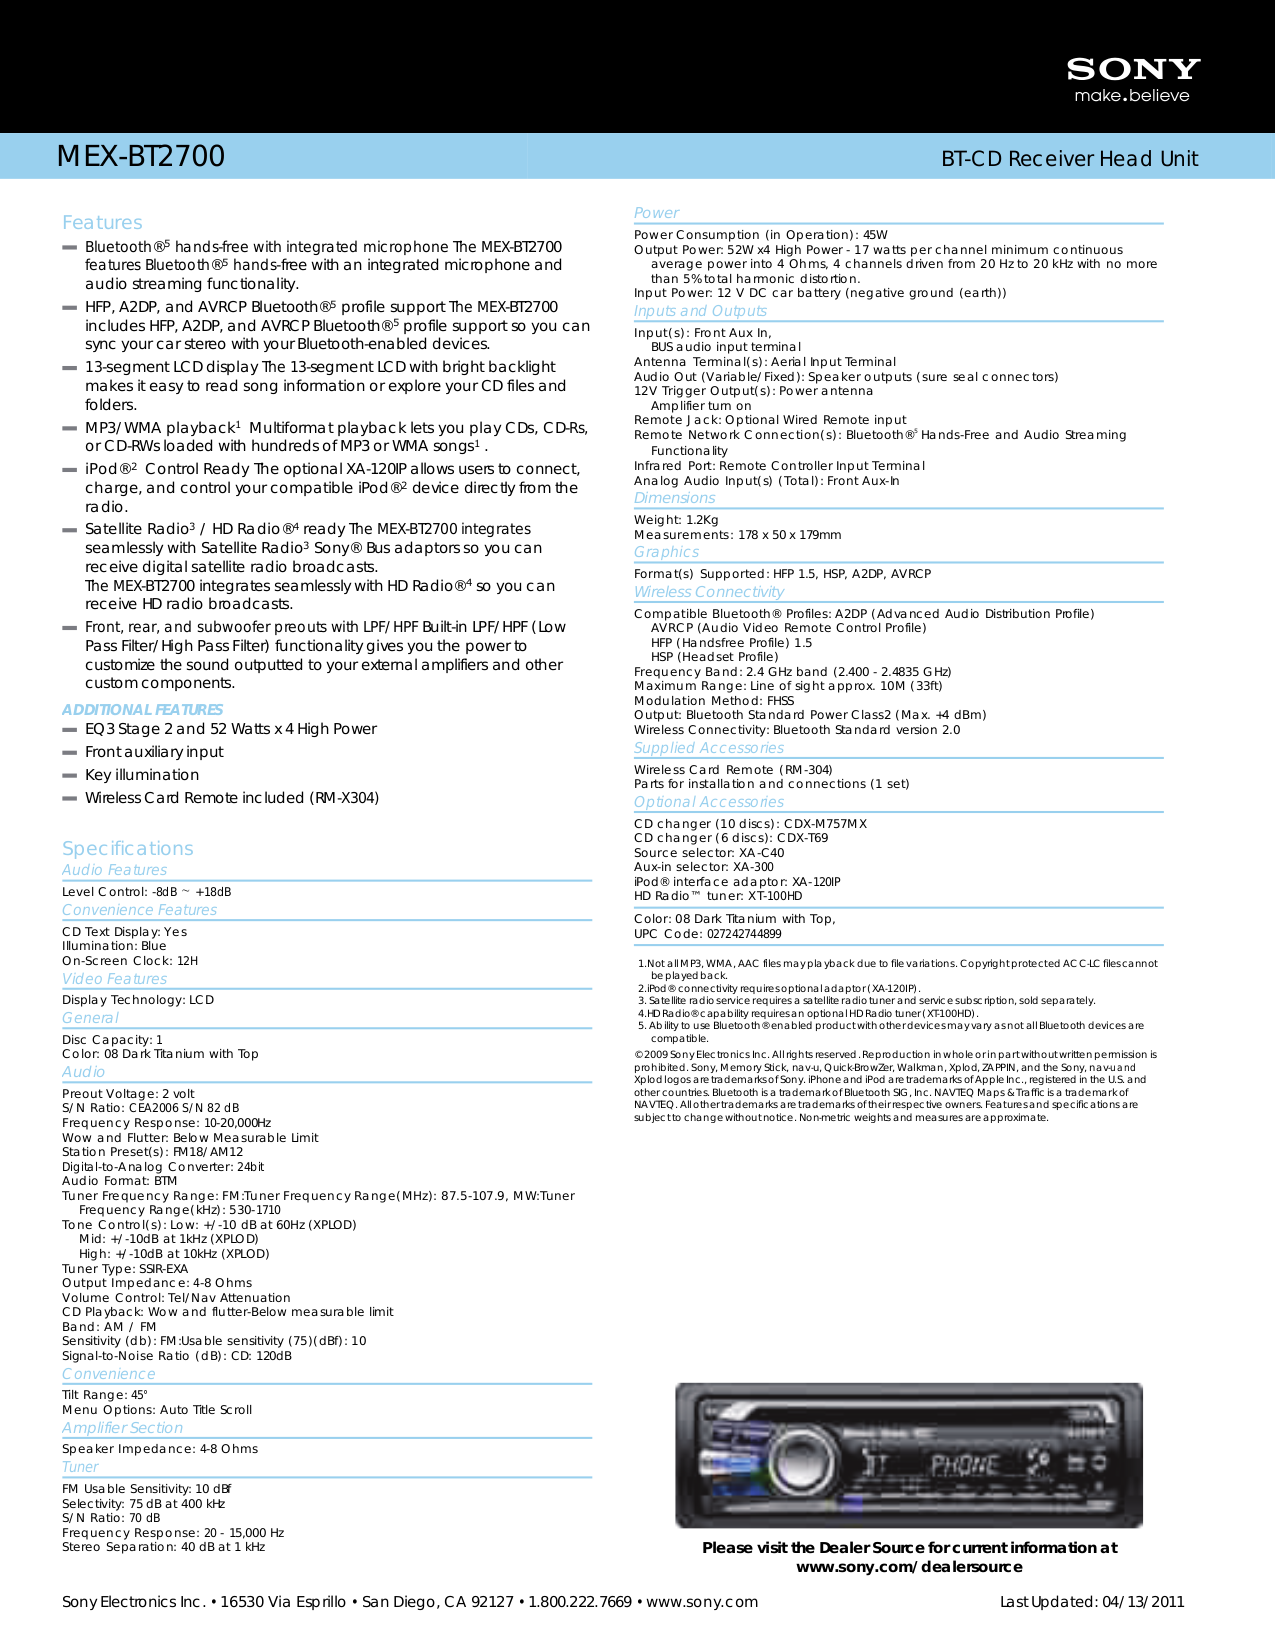 Sony Mex Bt2700 Wiring Diagram Diagrams Cdx Fw700 Pdf Manual For Car Receiver Xplod